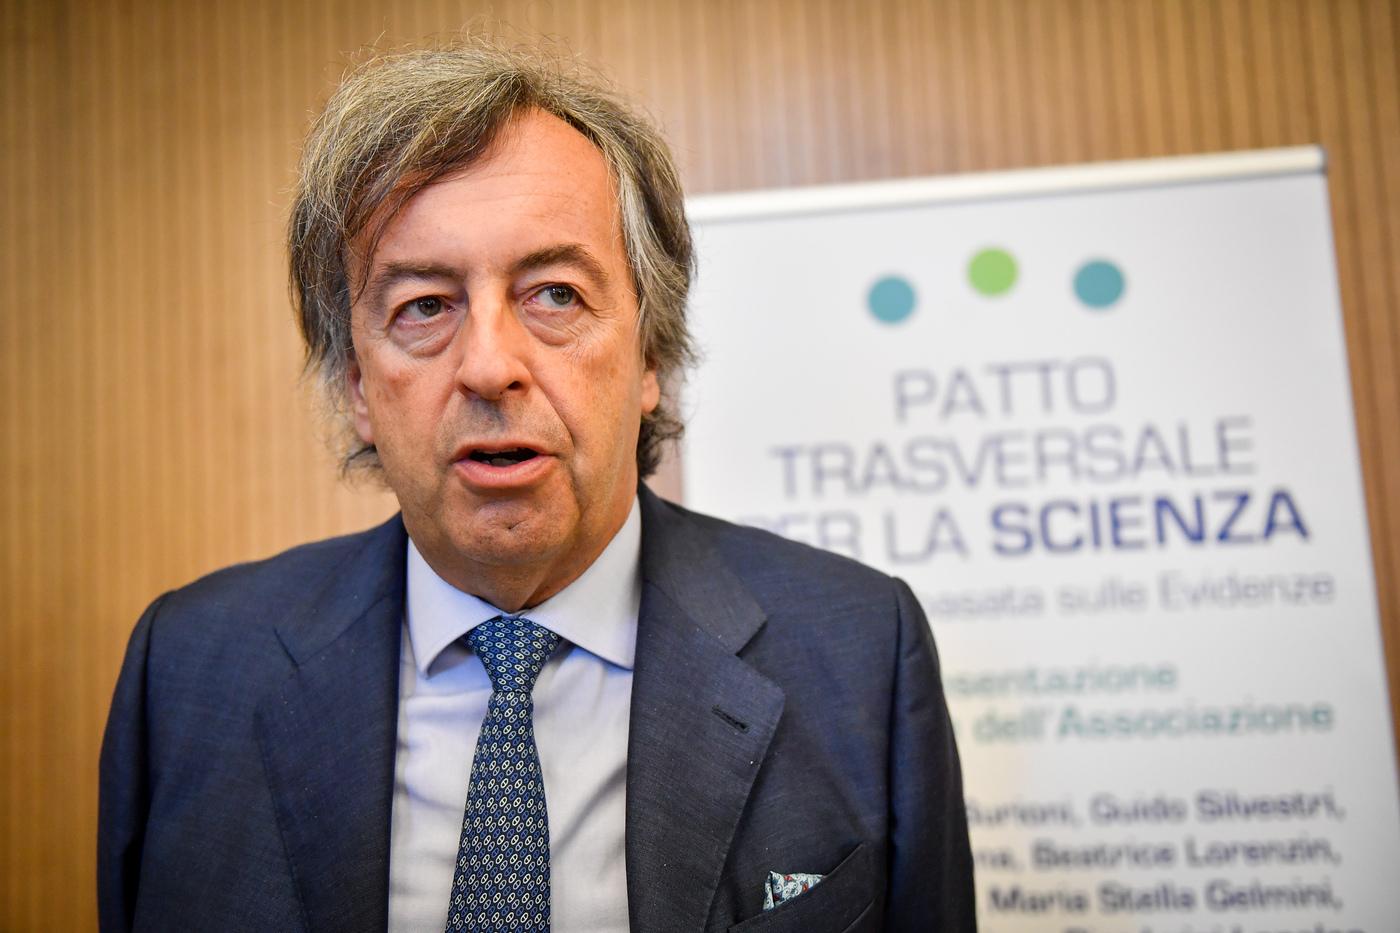 Il business dei virologi in tv: compensi da capogiro per Burioni e Capua